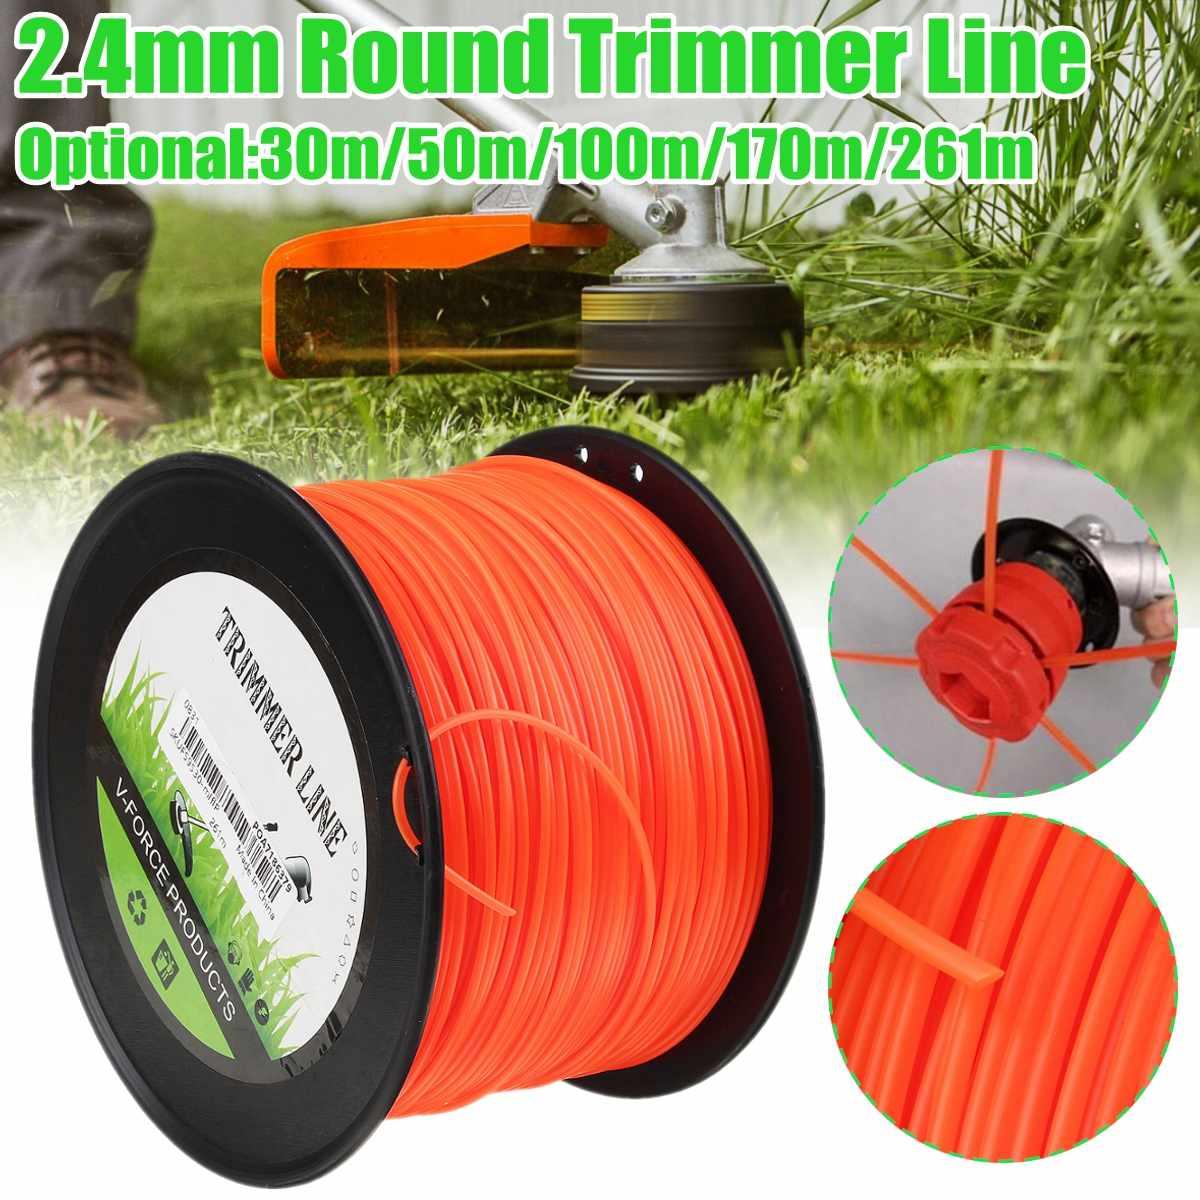 2.4mm x 50m/100m/261m Lawn Mower Trimmer Line Nylon Rope Brushcutter Grass Thread Mowing Wire Cutting Tool Garden